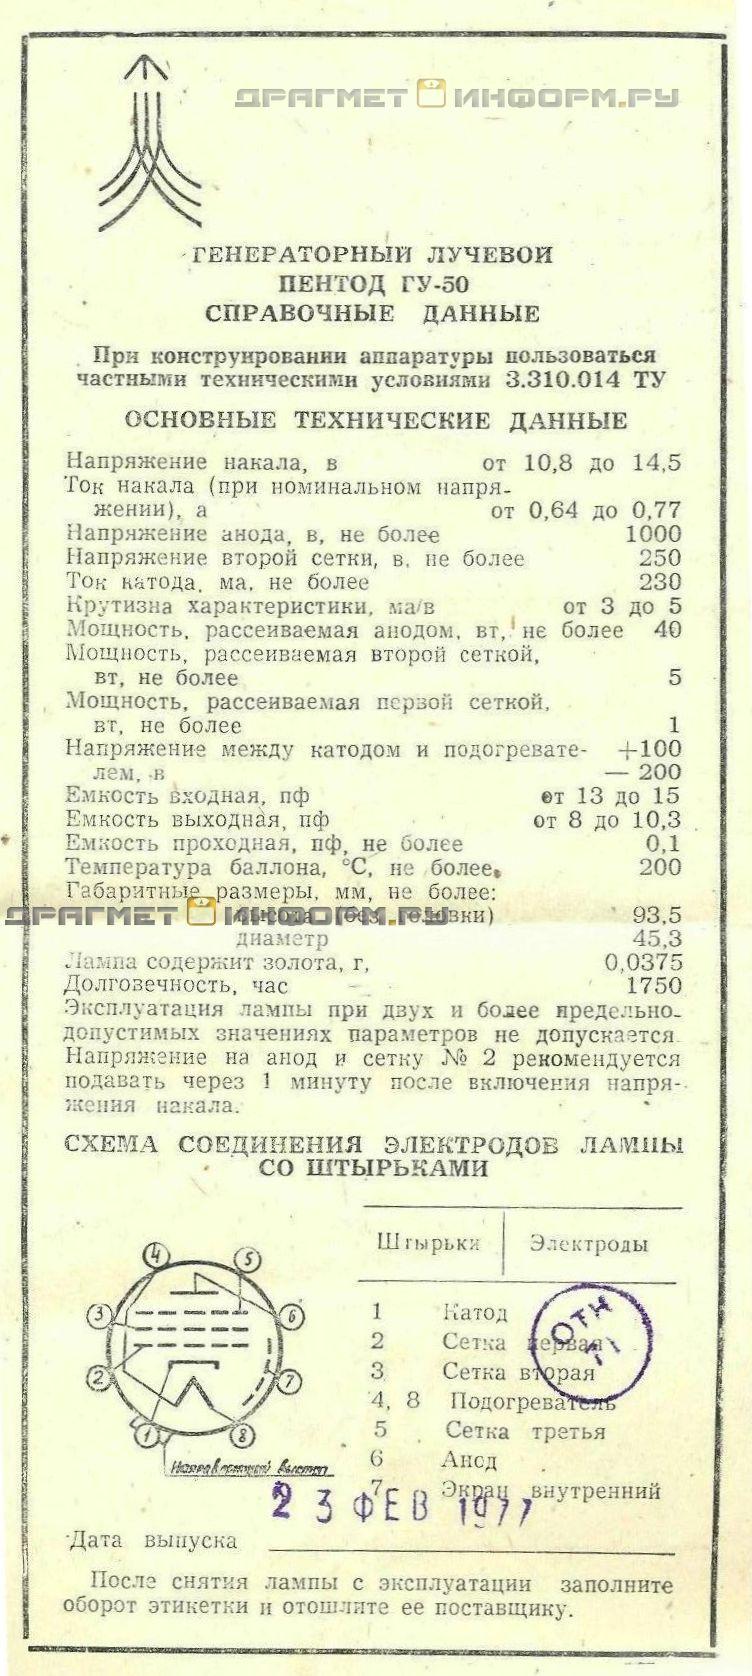 Формуляр ГУ-50